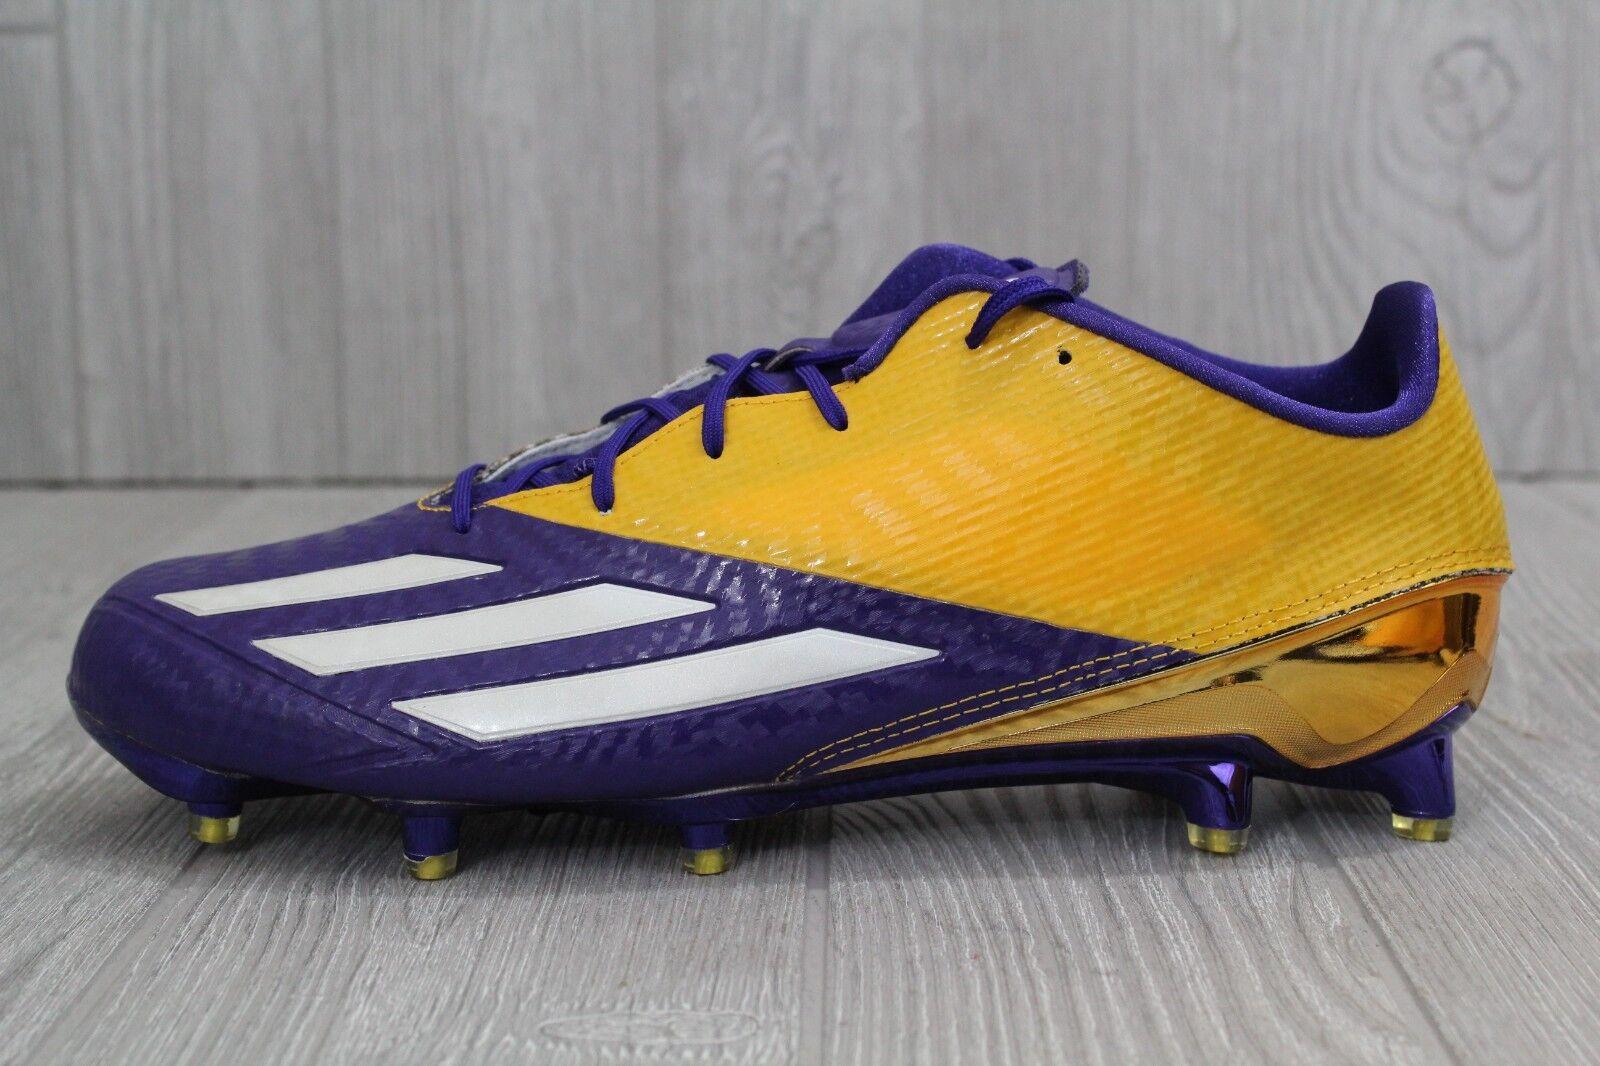 30 New Adidas Mens 5 Star 5.0 Purple Gold Lakers Football Cleats AQ7175 12 12.5